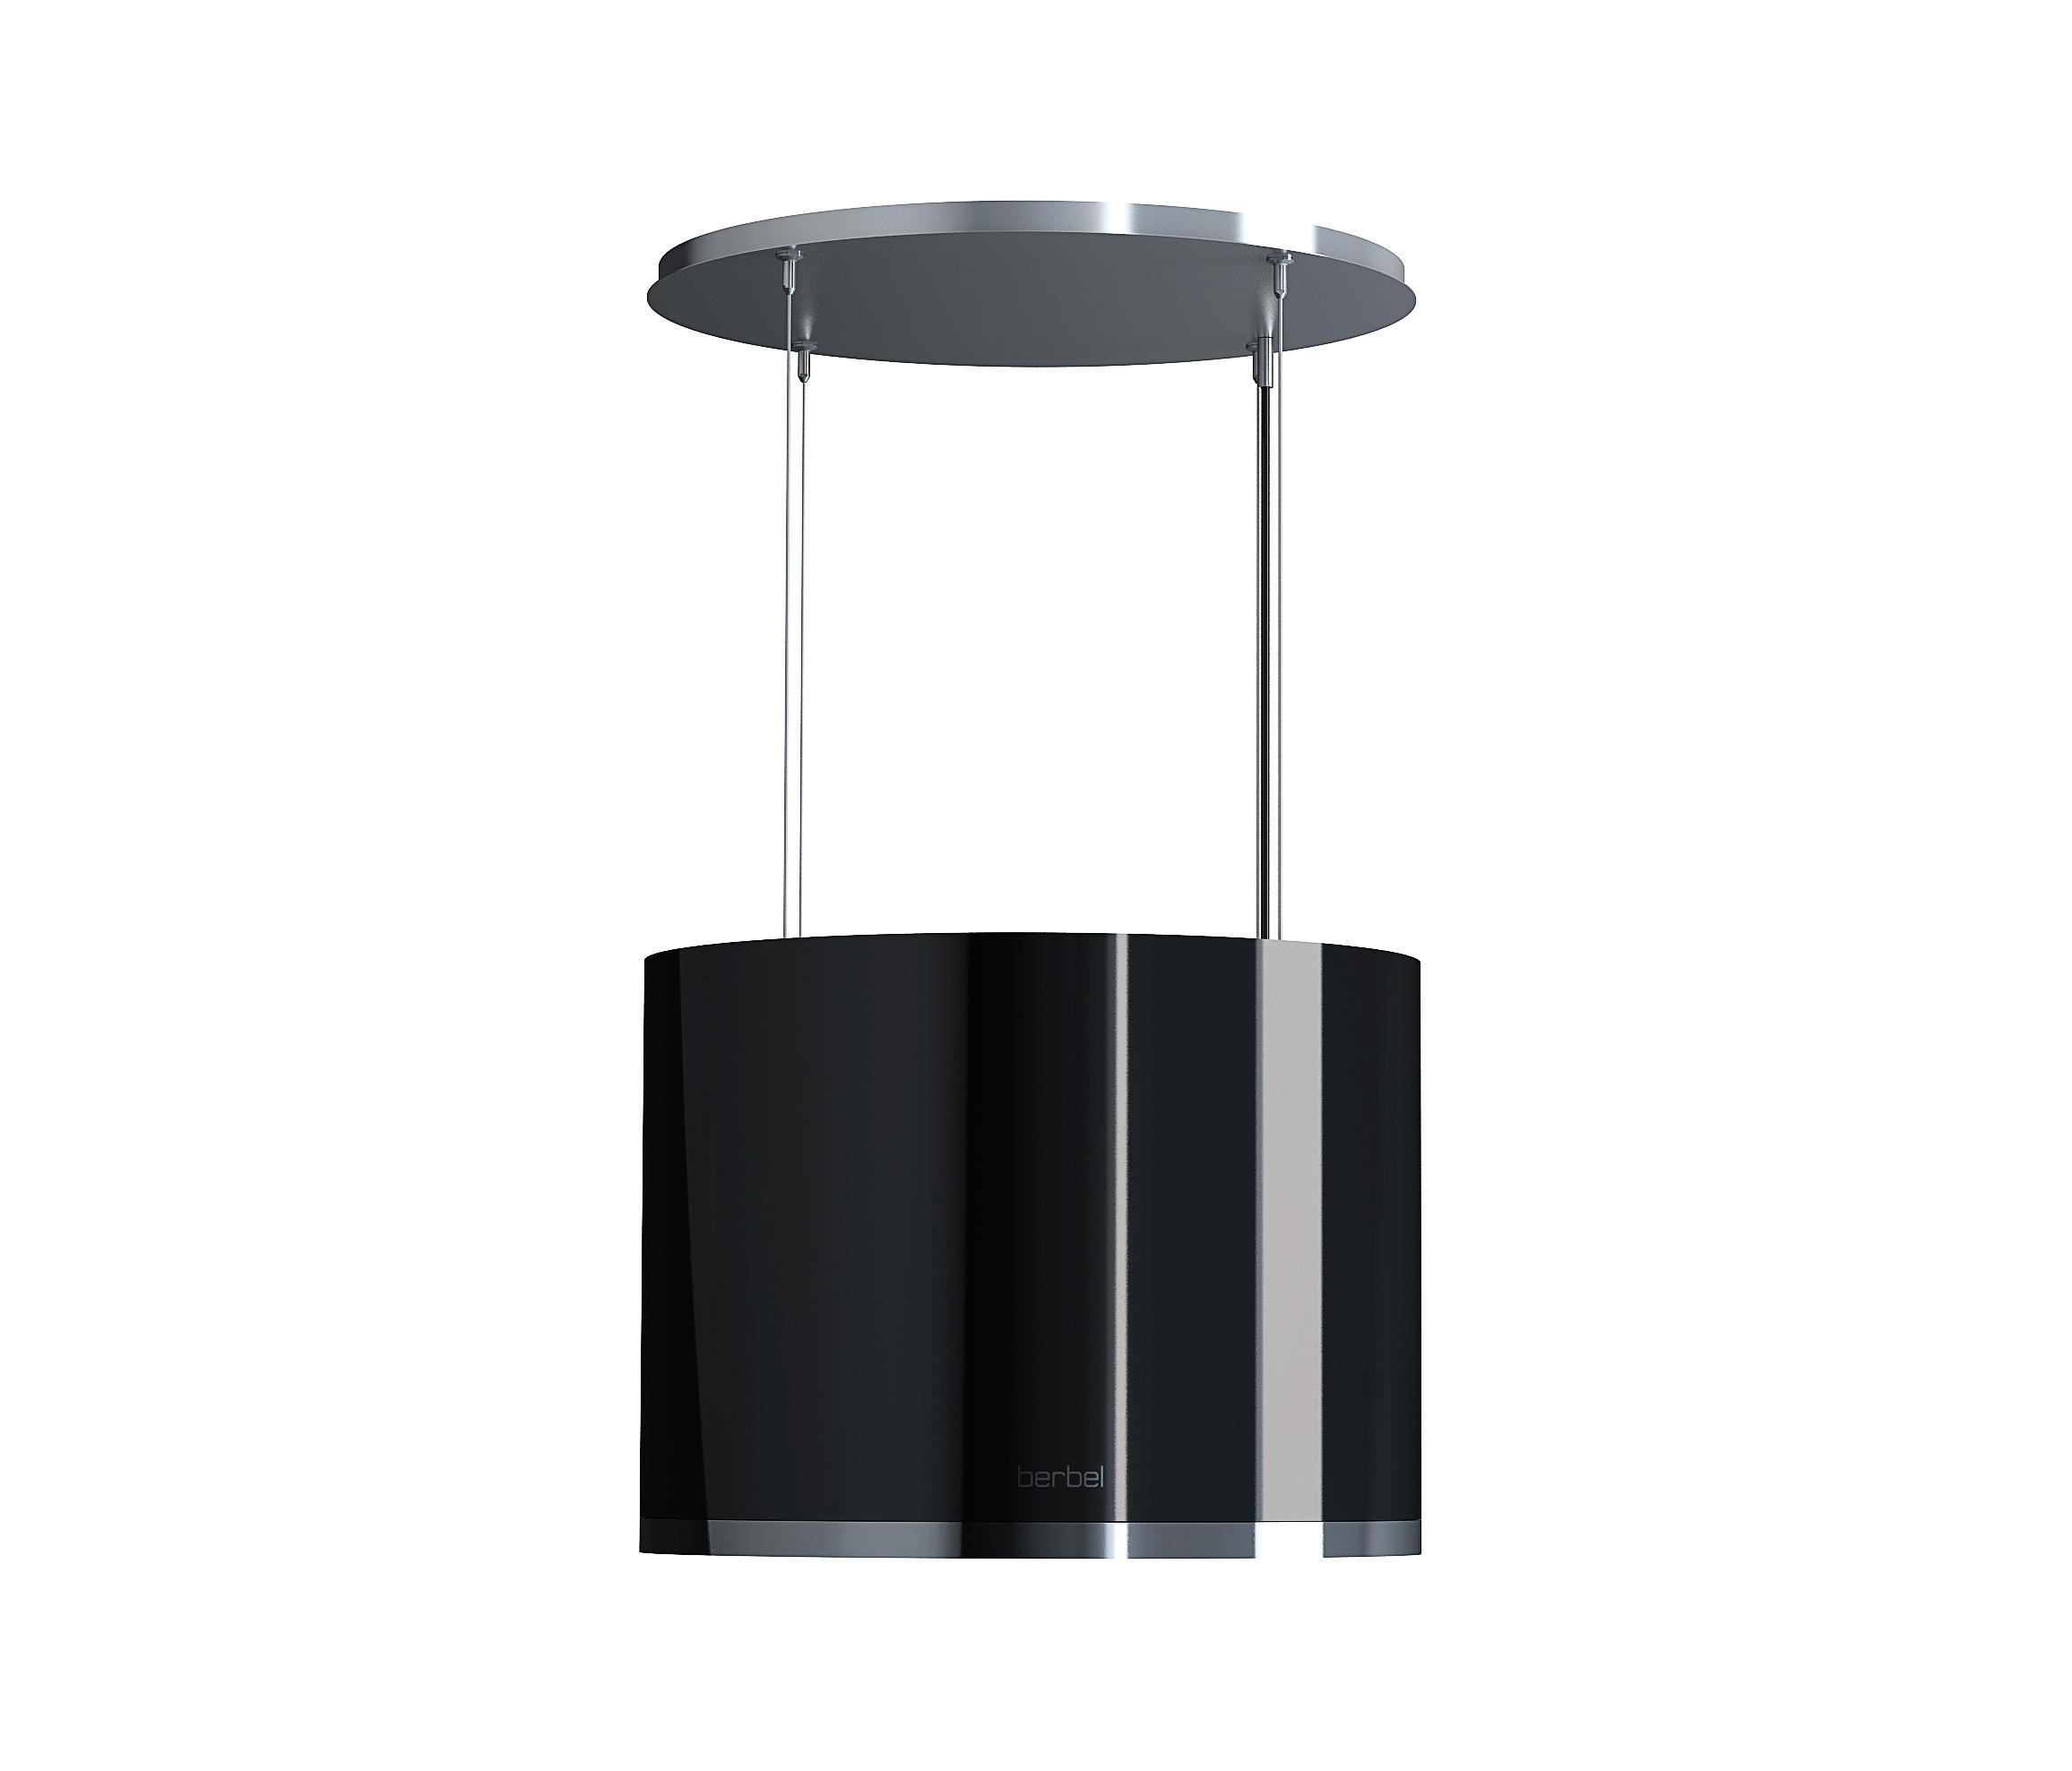 ceiling lift hood skyline round hottes de cuisine de berbel architonic. Black Bedroom Furniture Sets. Home Design Ideas